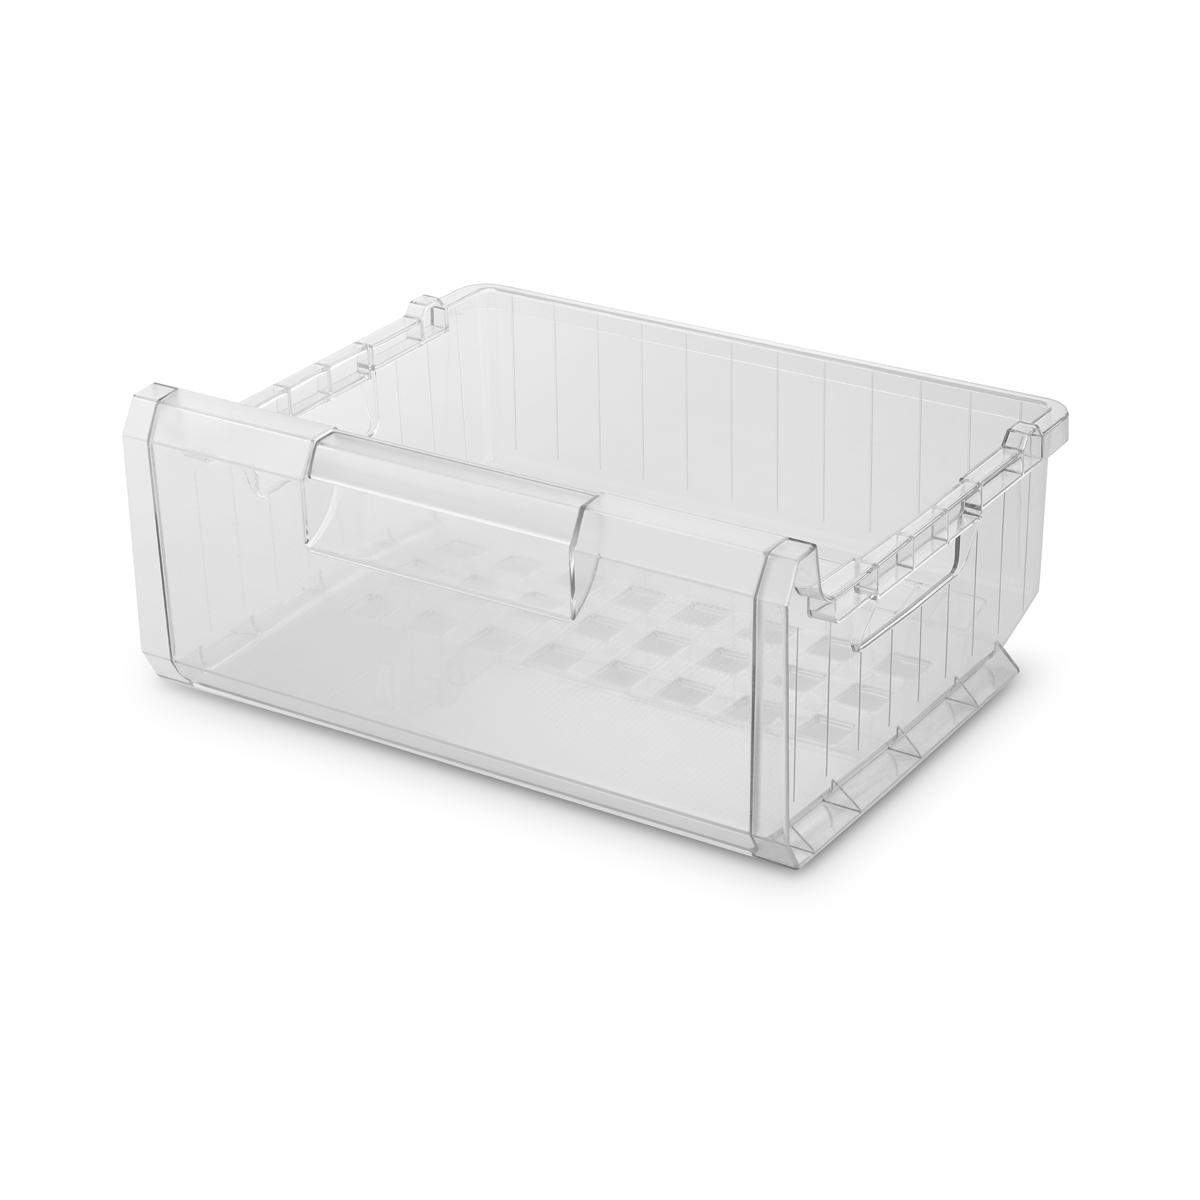 moulds_industry_plastic